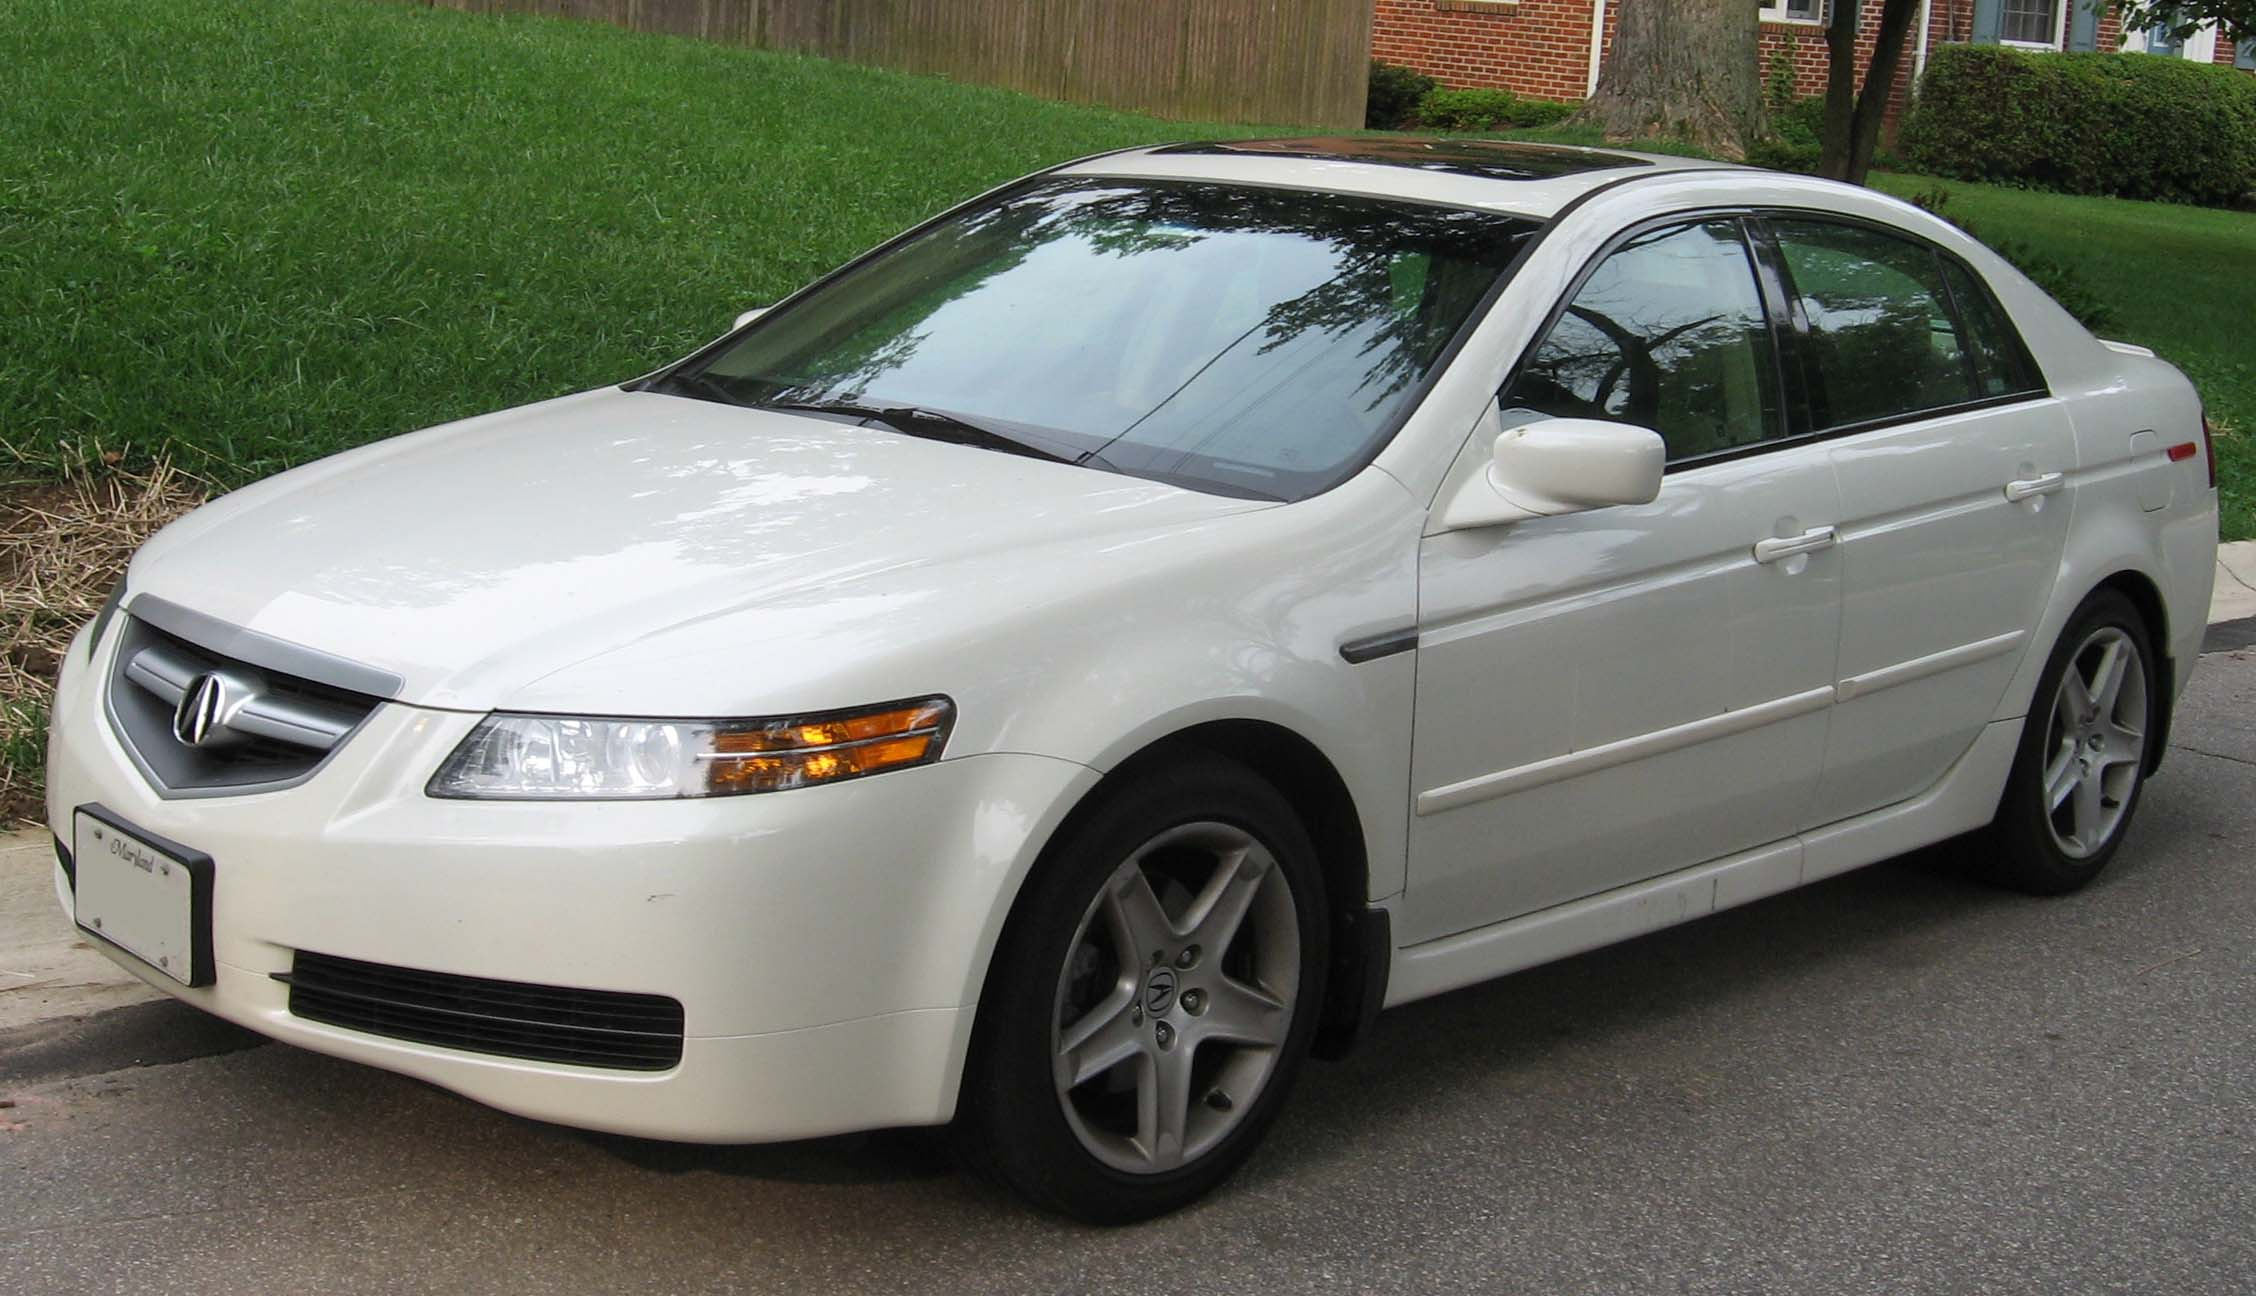 File:2004-2006 Acura TL.jpg - Wikimedia Commons